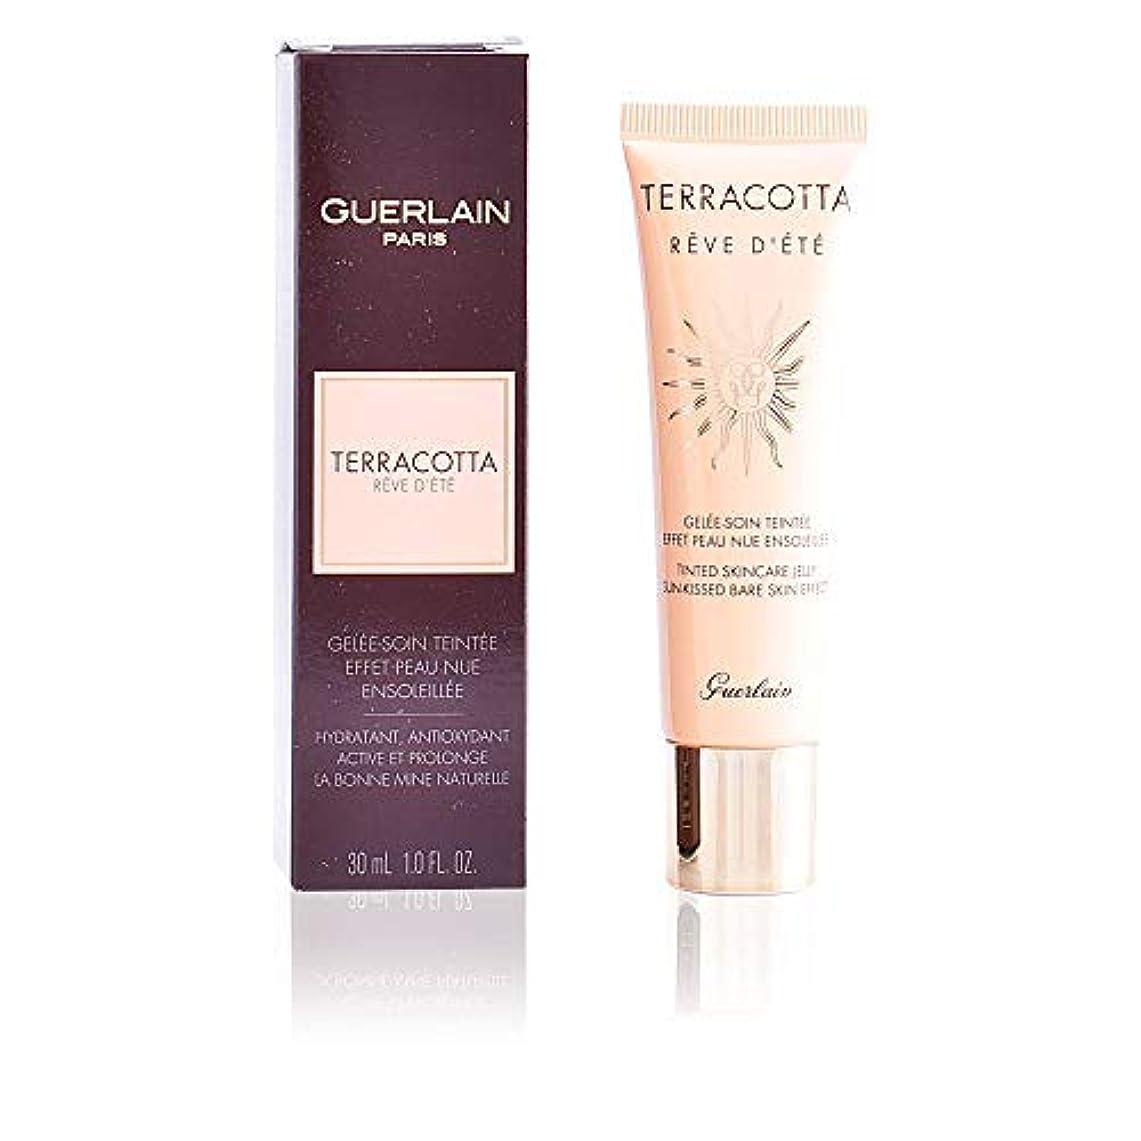 一族有益土器ゲラン Terracotta Reve D'ete Tinted Skincare Jelly - # Light 30ml/1oz並行輸入品